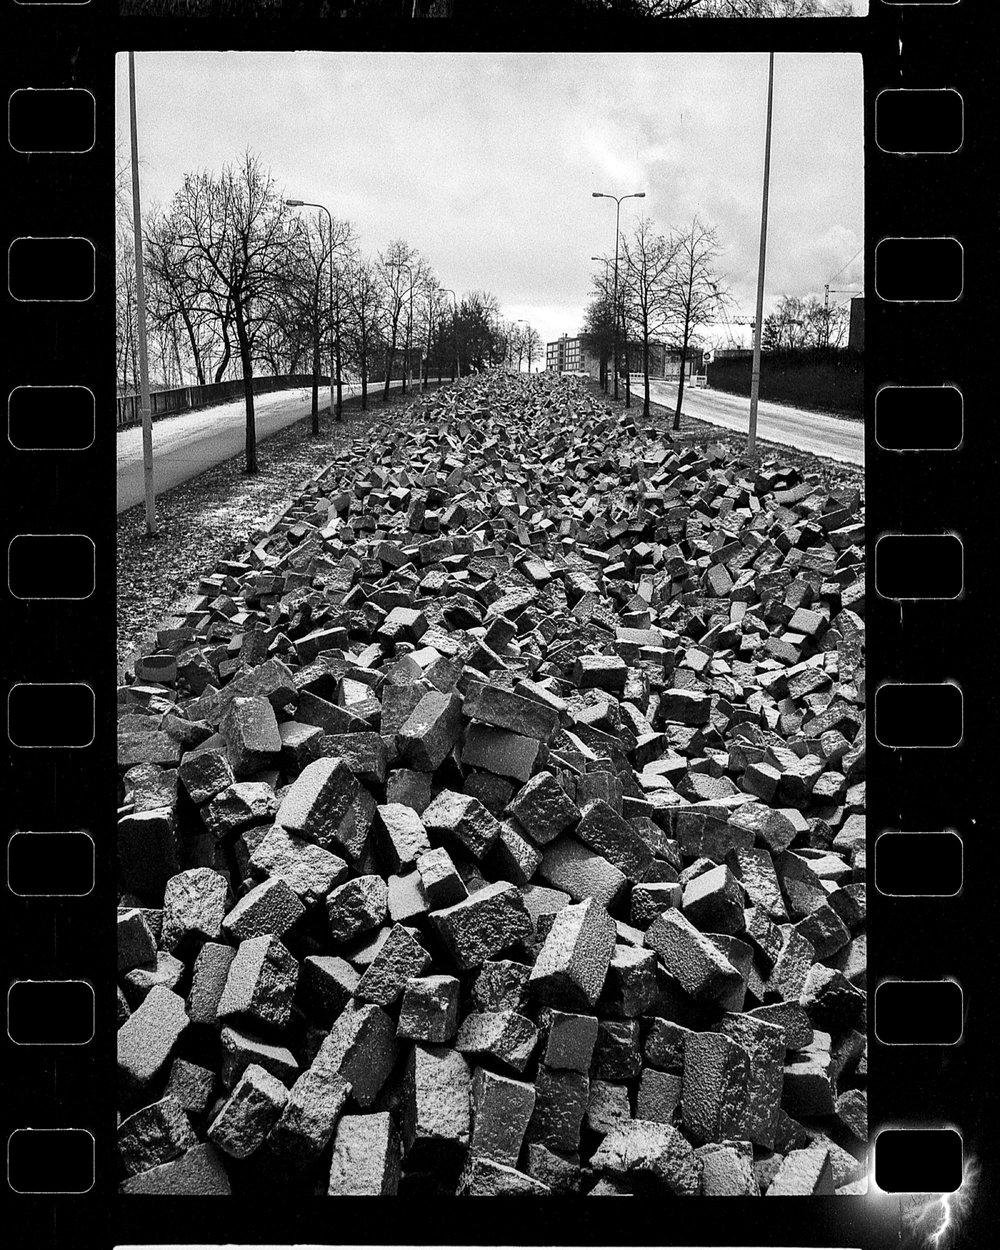 santa_1000_new_black_and_white_film_35mm_1.jpeg